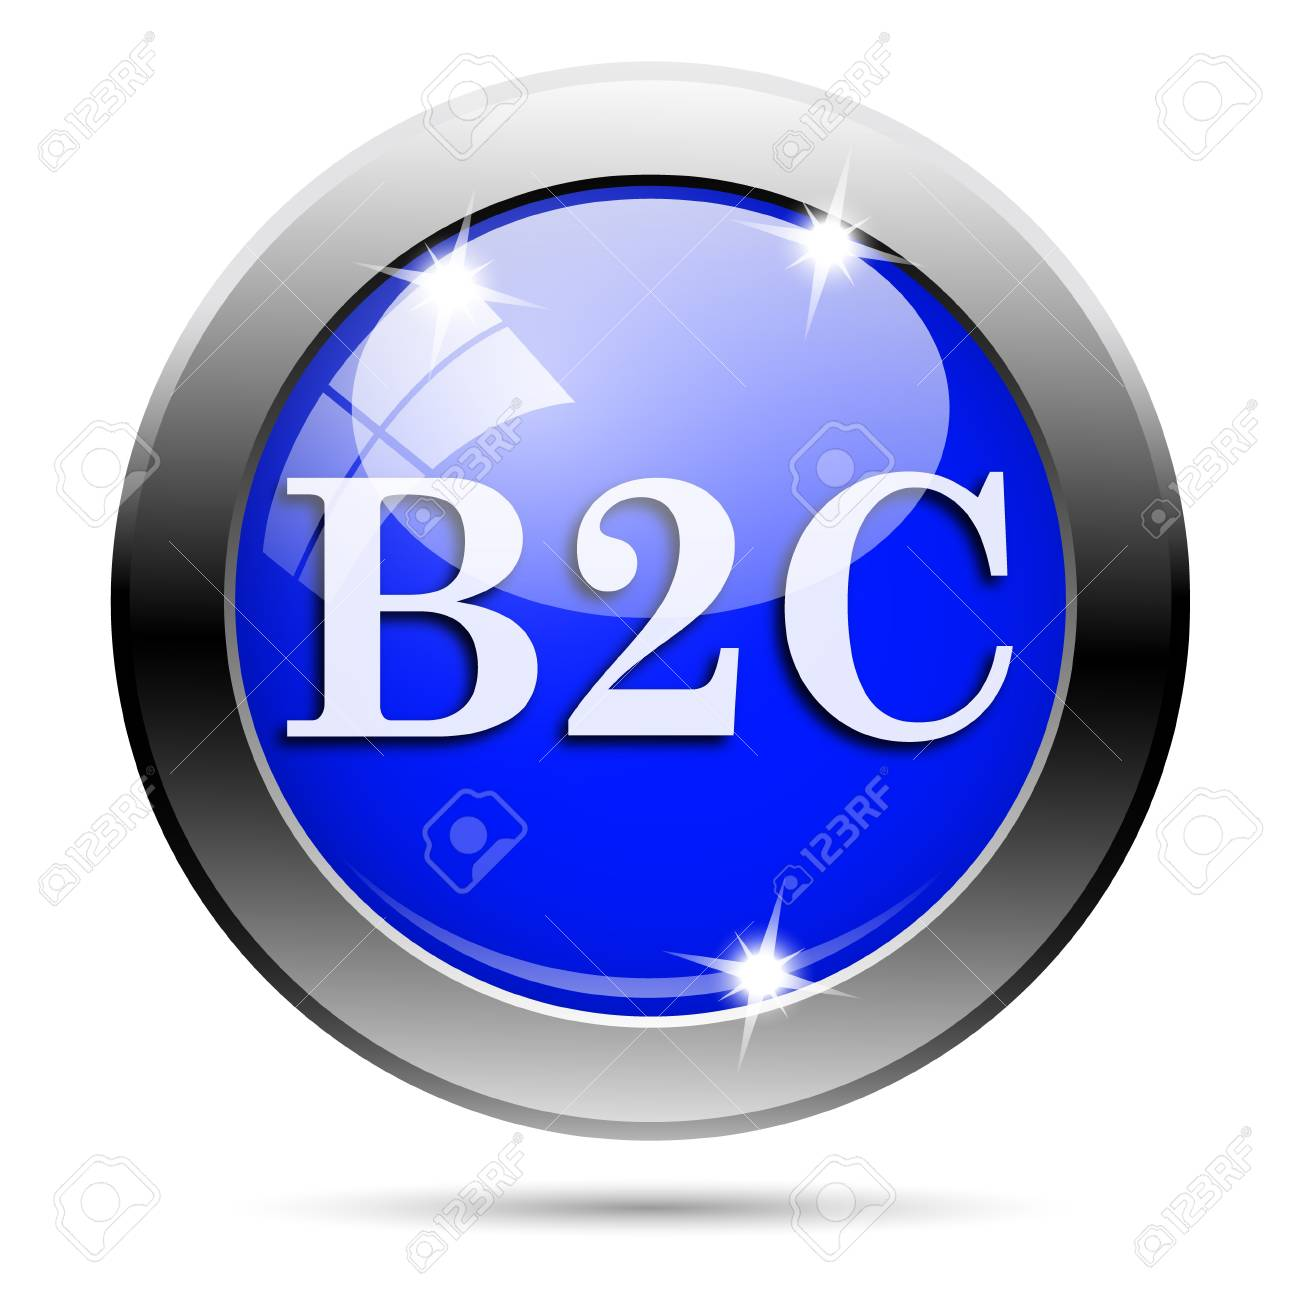 Metallic round glossy icon with white design on blue background Stock Photo - 21986507